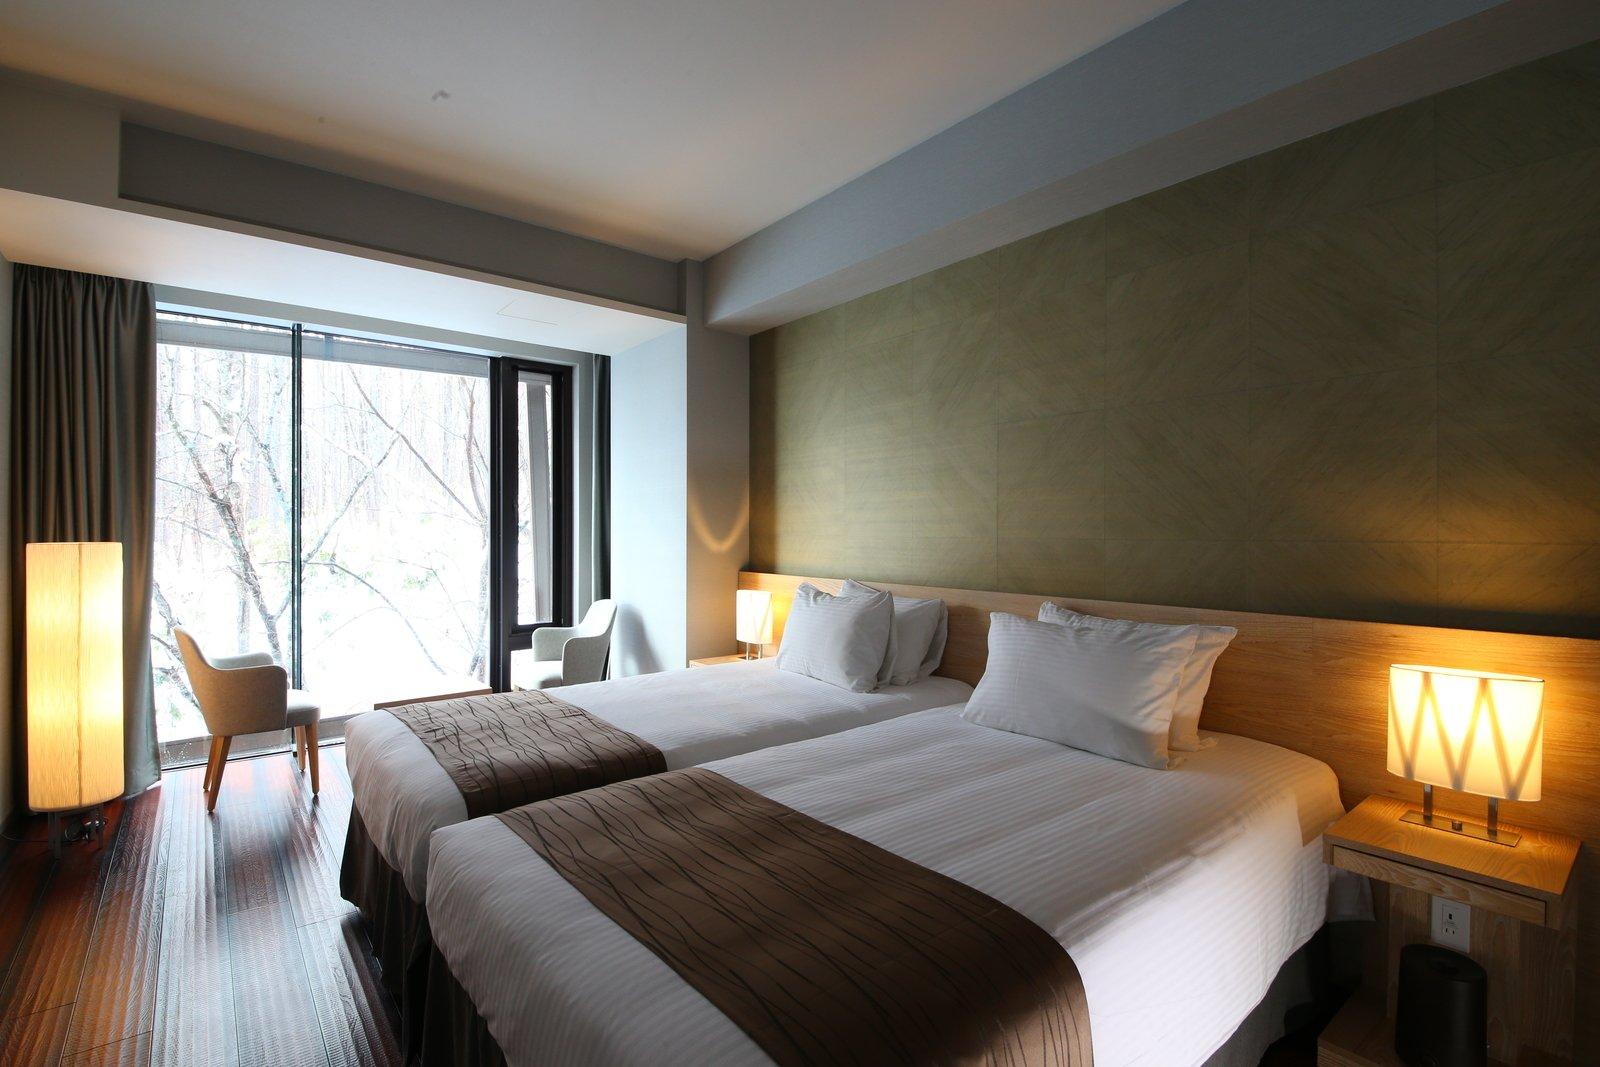 3 bedroom 12 large